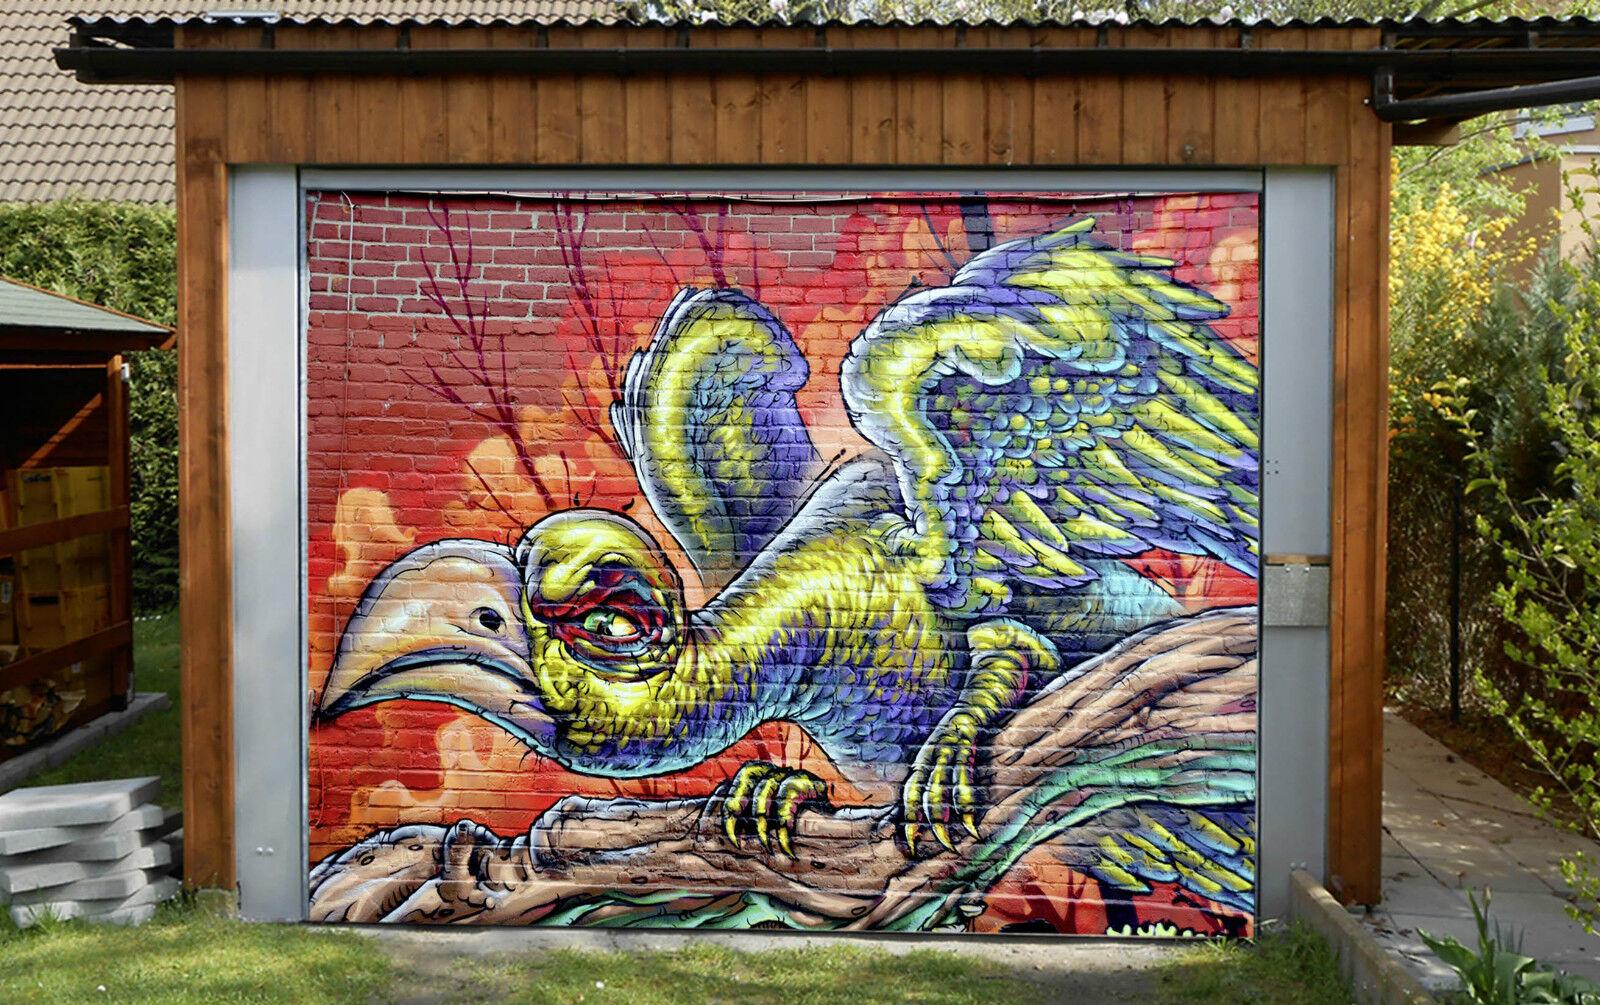 3D Graffiti Aquila Garage Porta Stampe Parete Decorazione Murale AJ WALLPAPER IT